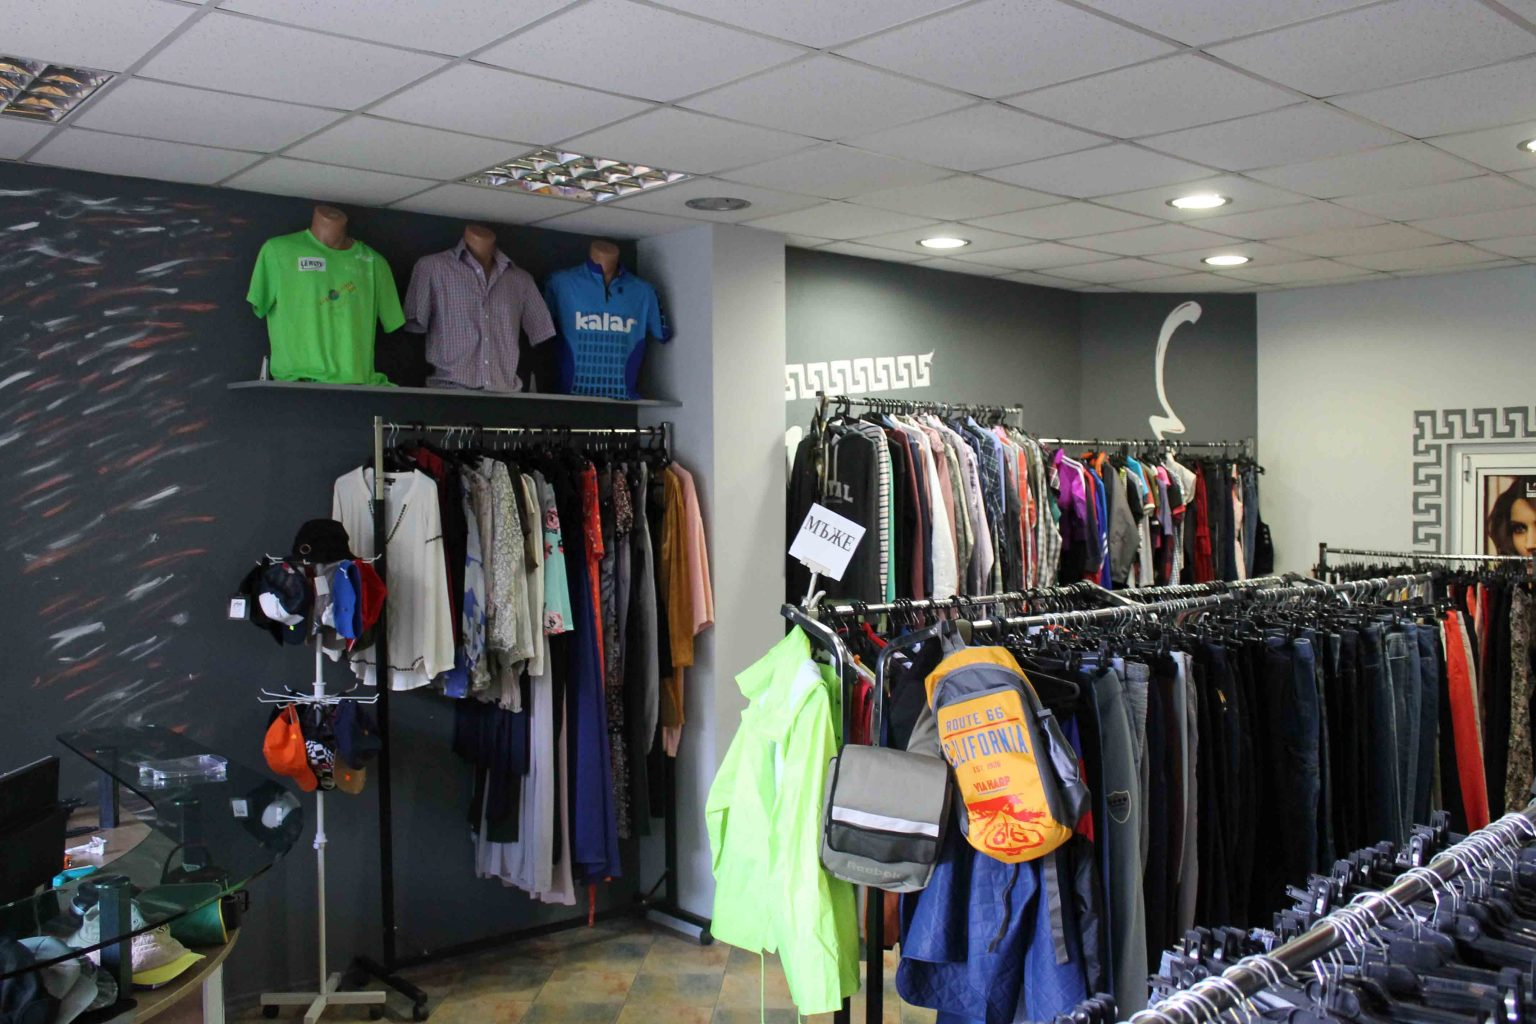 inside second hand clothes Shop Unisvyat Veliko Tarnovo Bulgaria 2020 second hand clothes